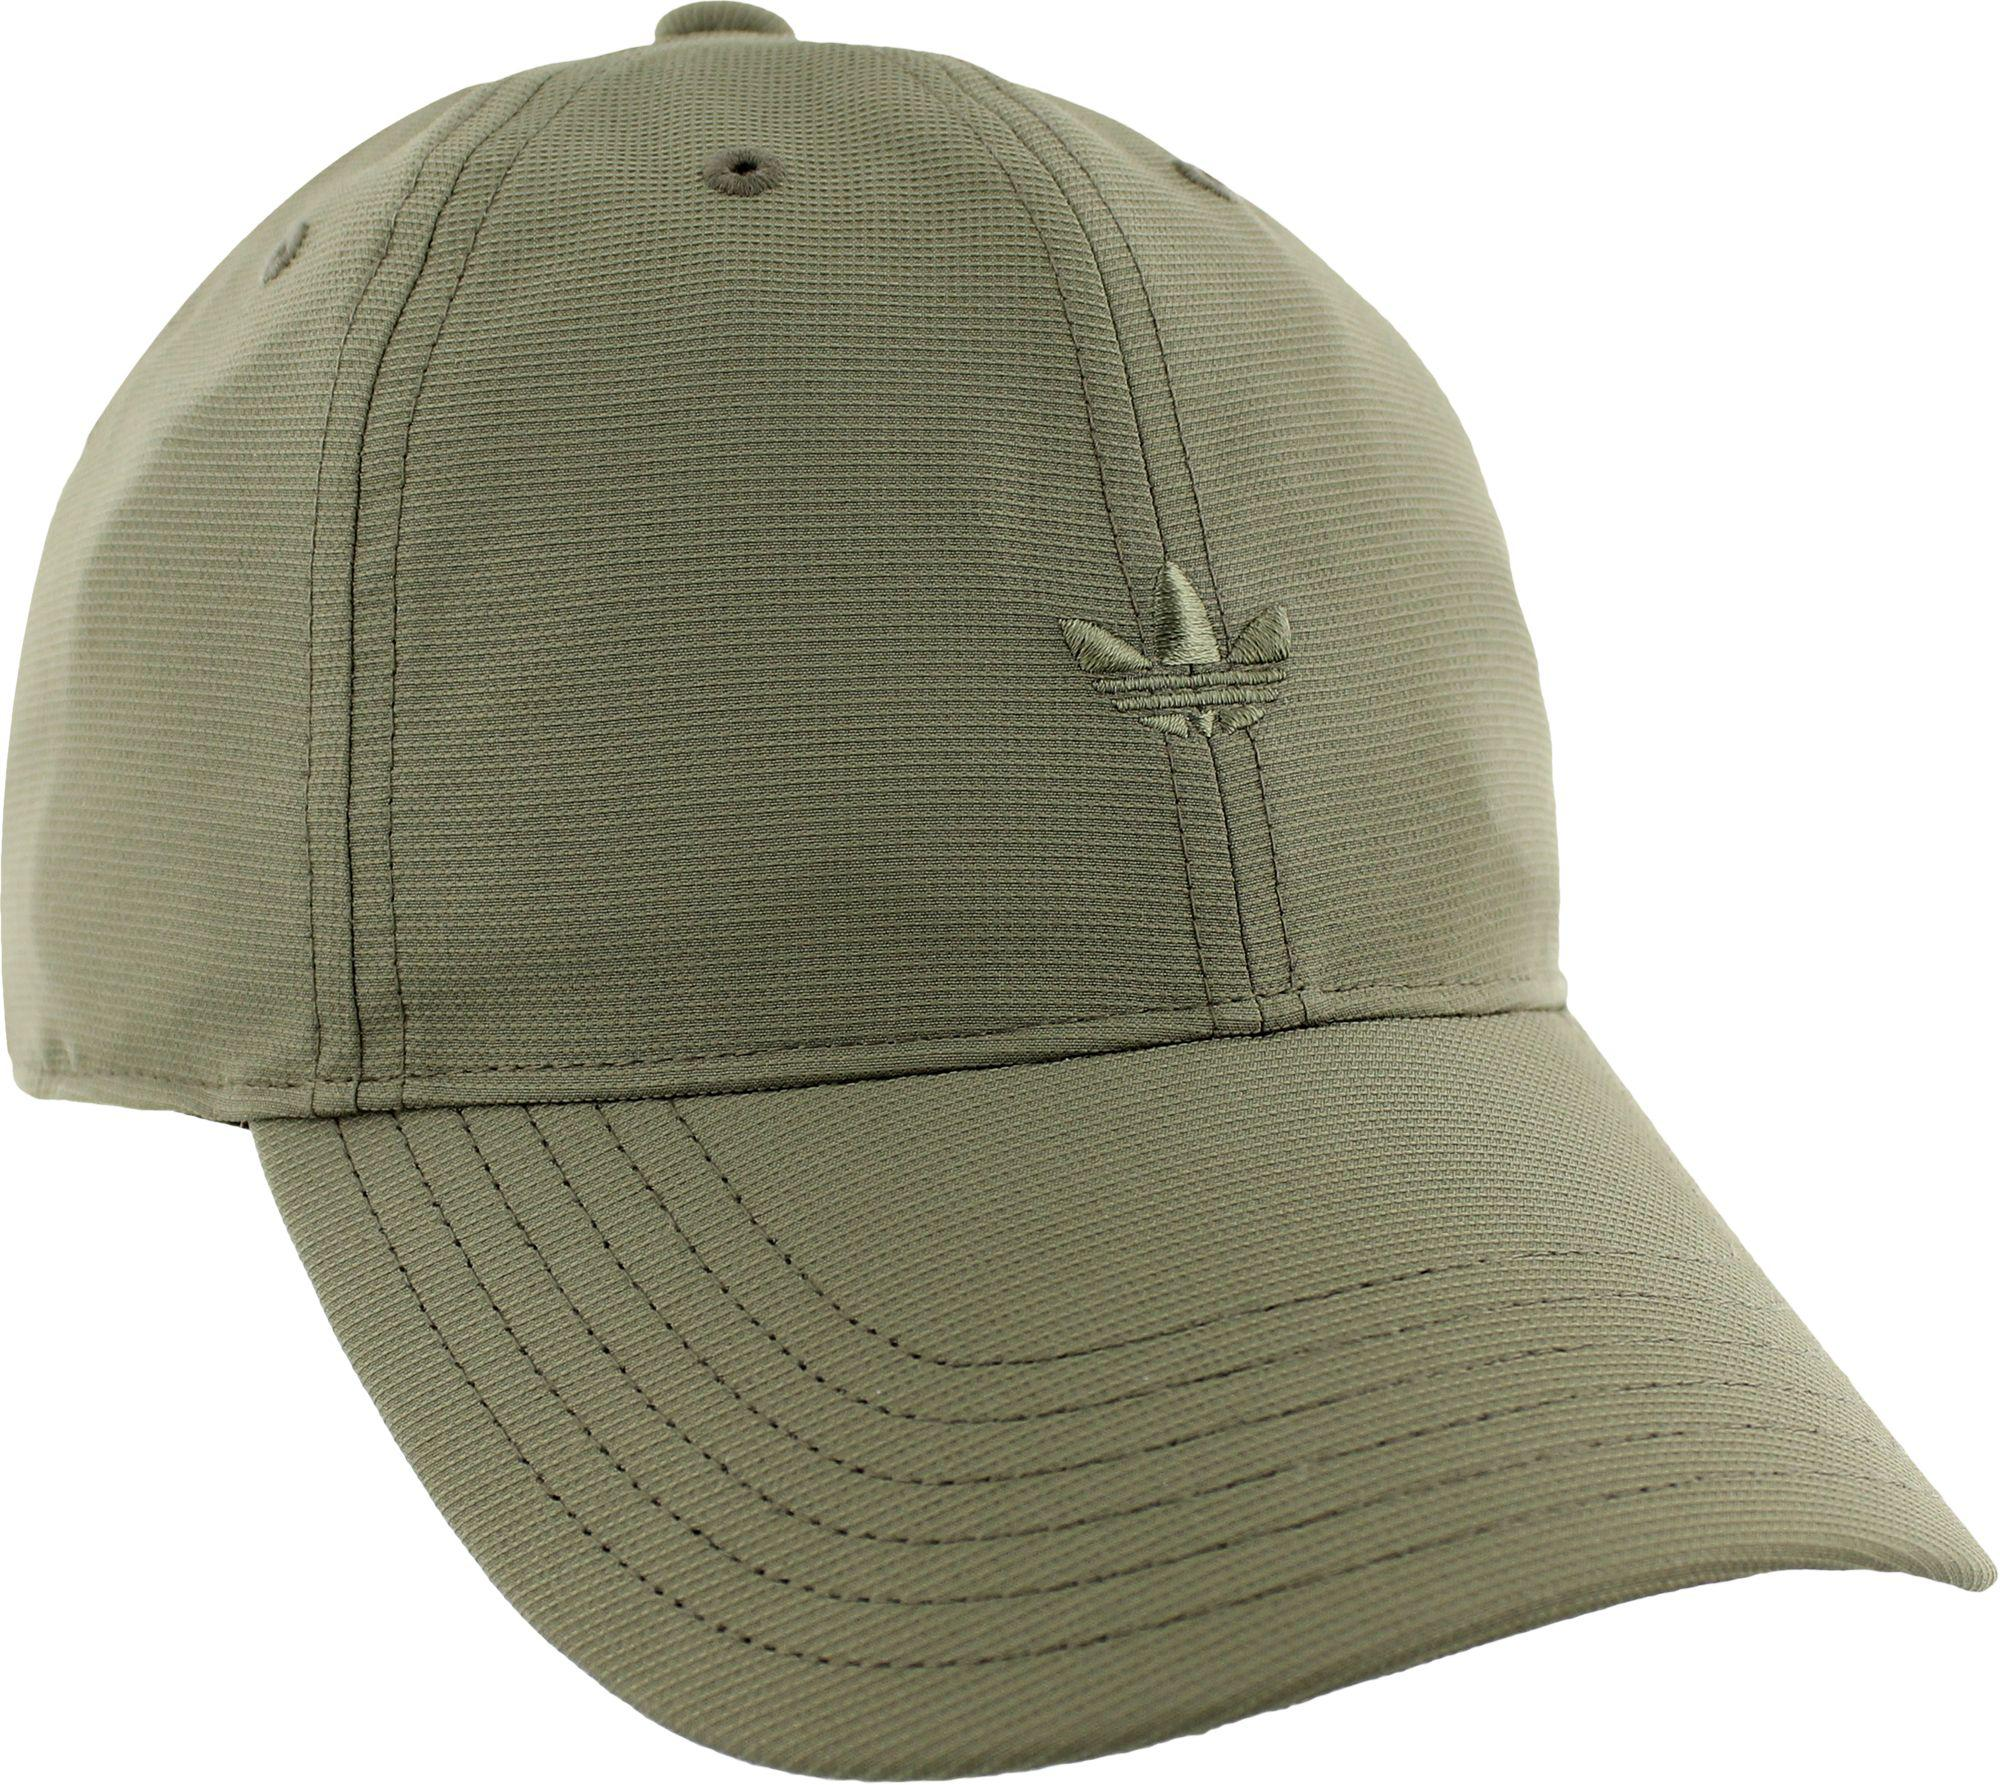 2c569d54 ... closeout lyst adidas originals originals relaxed modern cap in green  for men 0fdc4 b598f